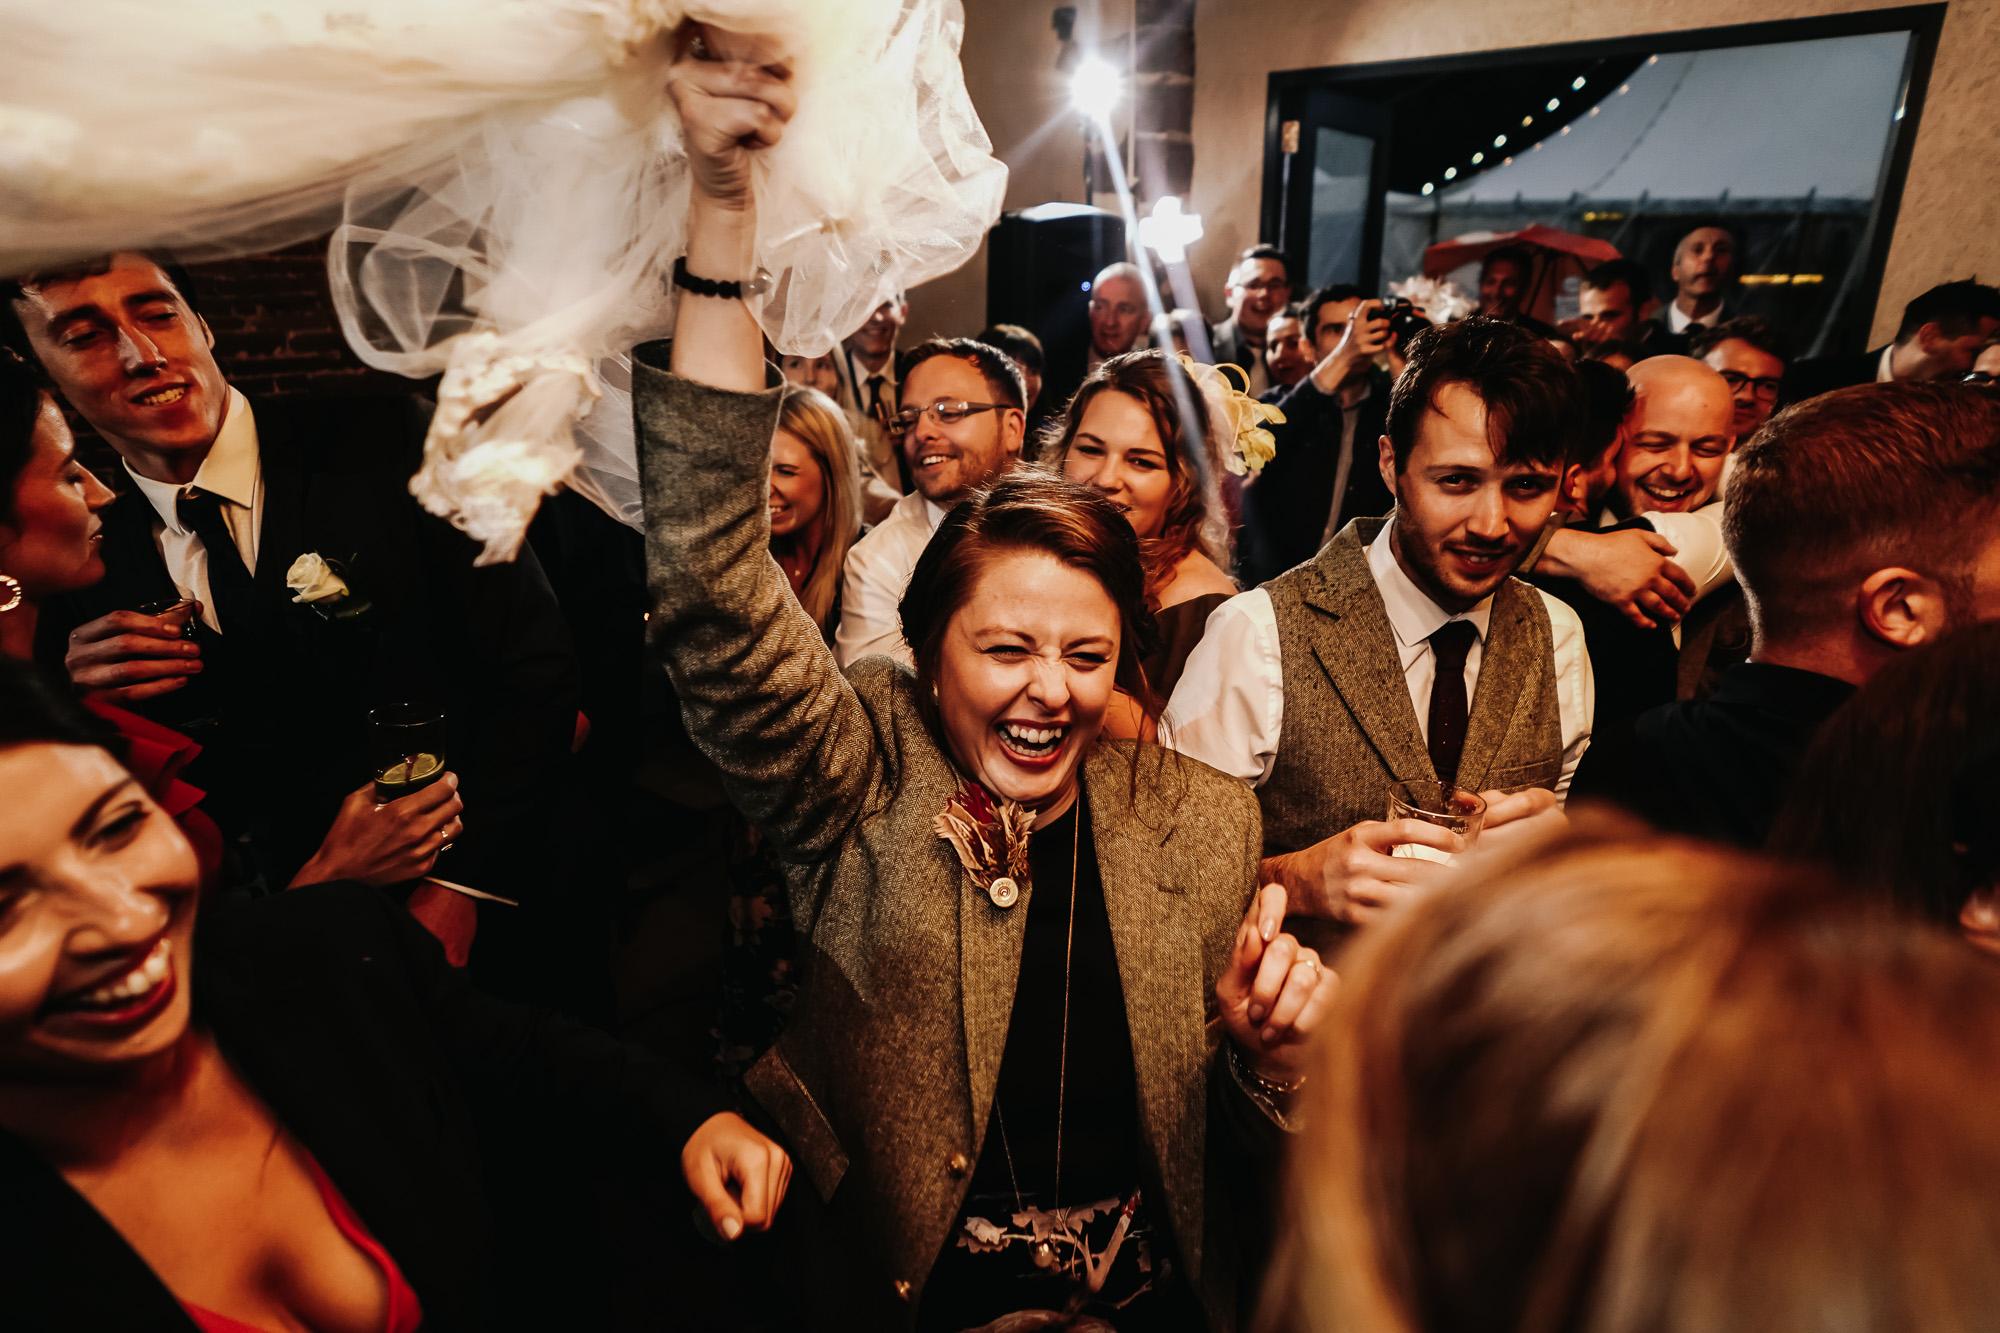 High Barn Wedding photographer lake distect penrith documentry wedding photography (55 of 57).jpg